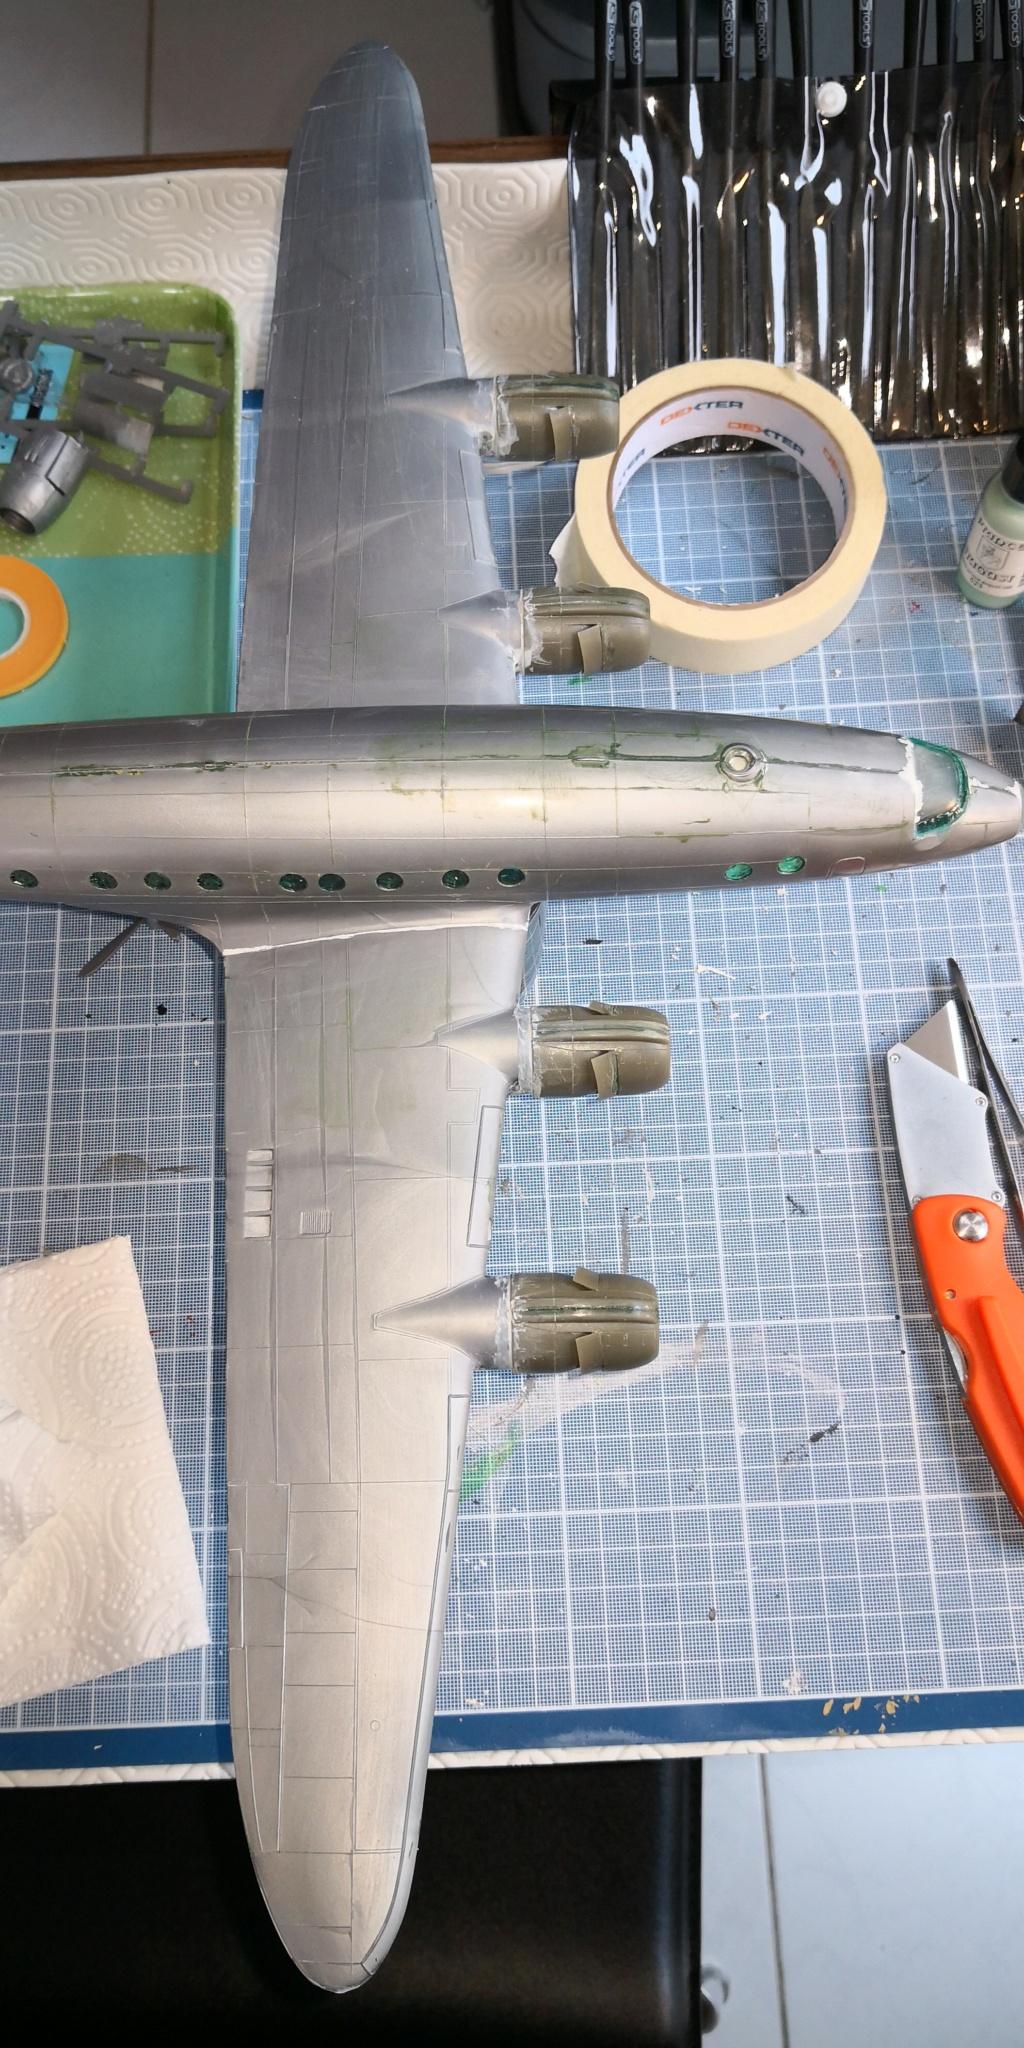 [HELLER] LOCKHEED CONSTELLATION C-121-A MATS BERLIN 1948 - 1949 1/72ème Réf 80382 - Page 2 Img_2017